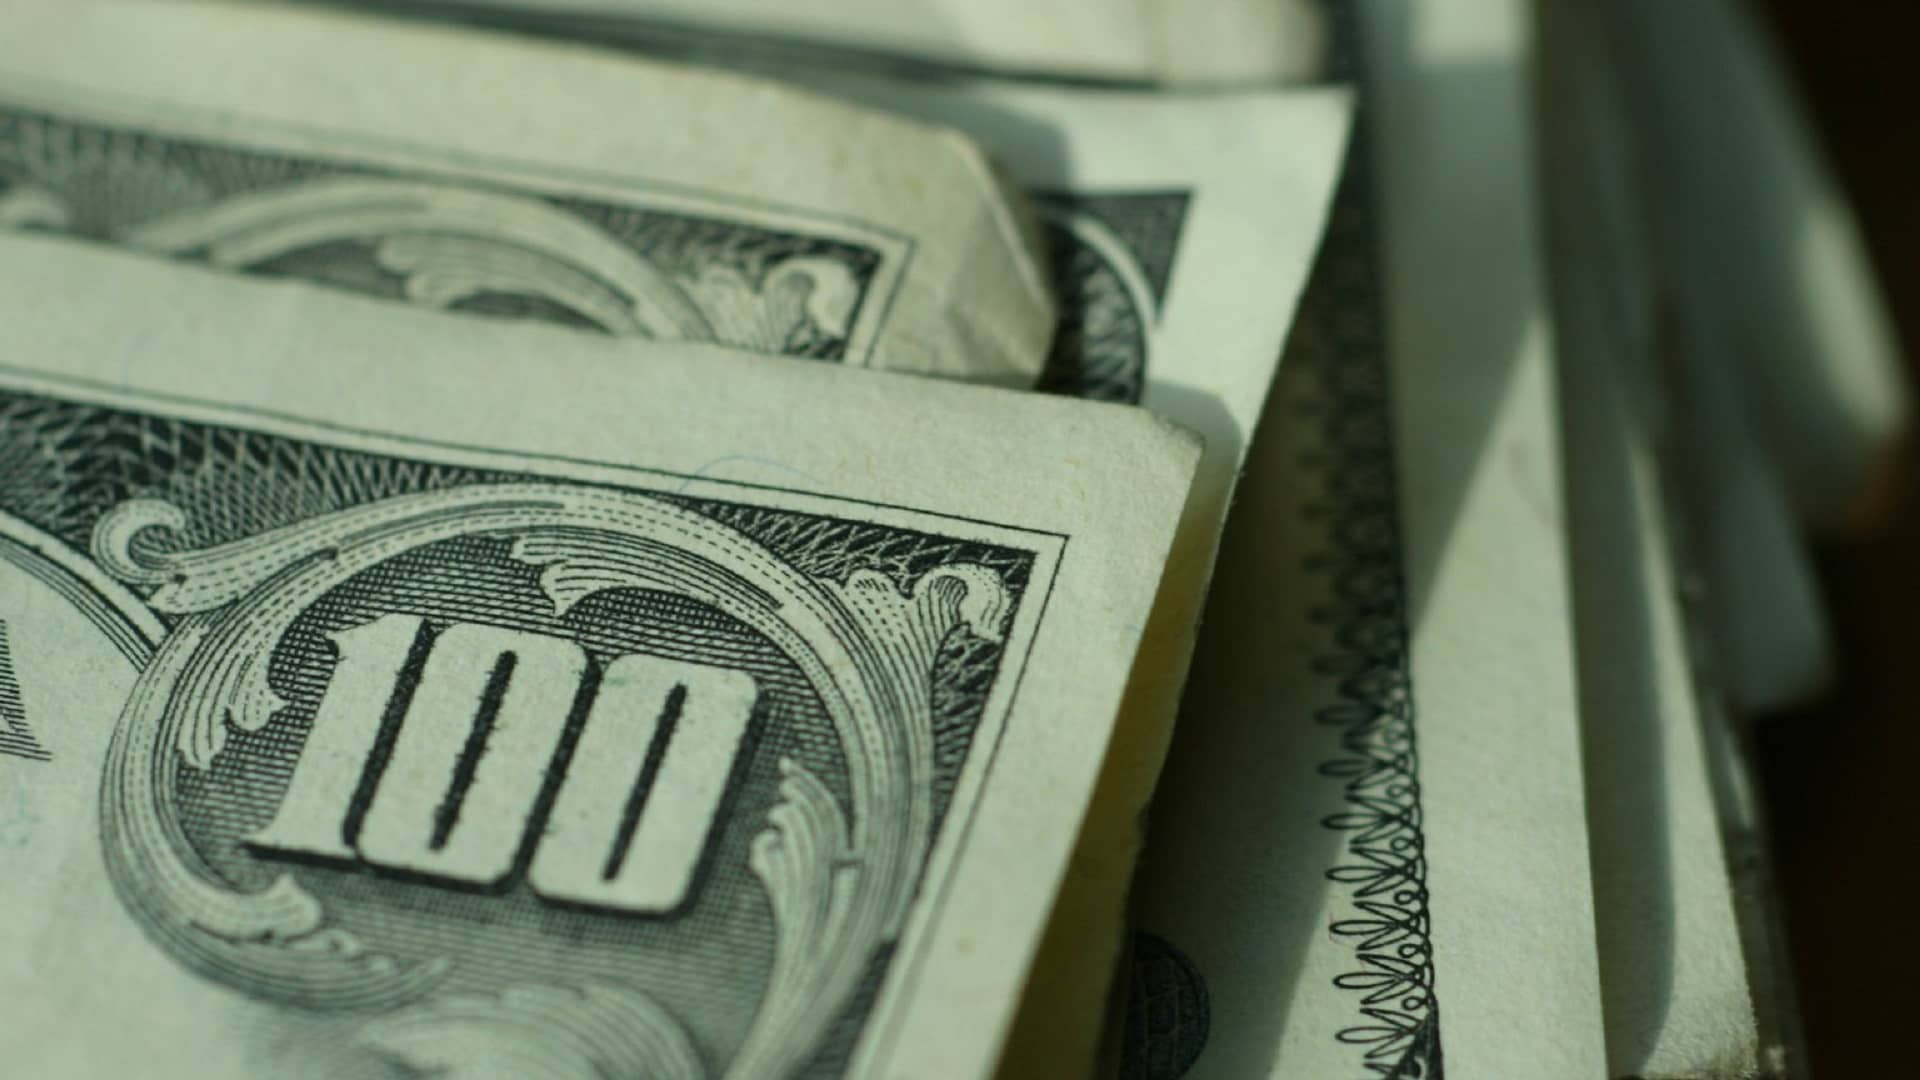 Delaware Senate OKs bill on cash bail, sends it to the House